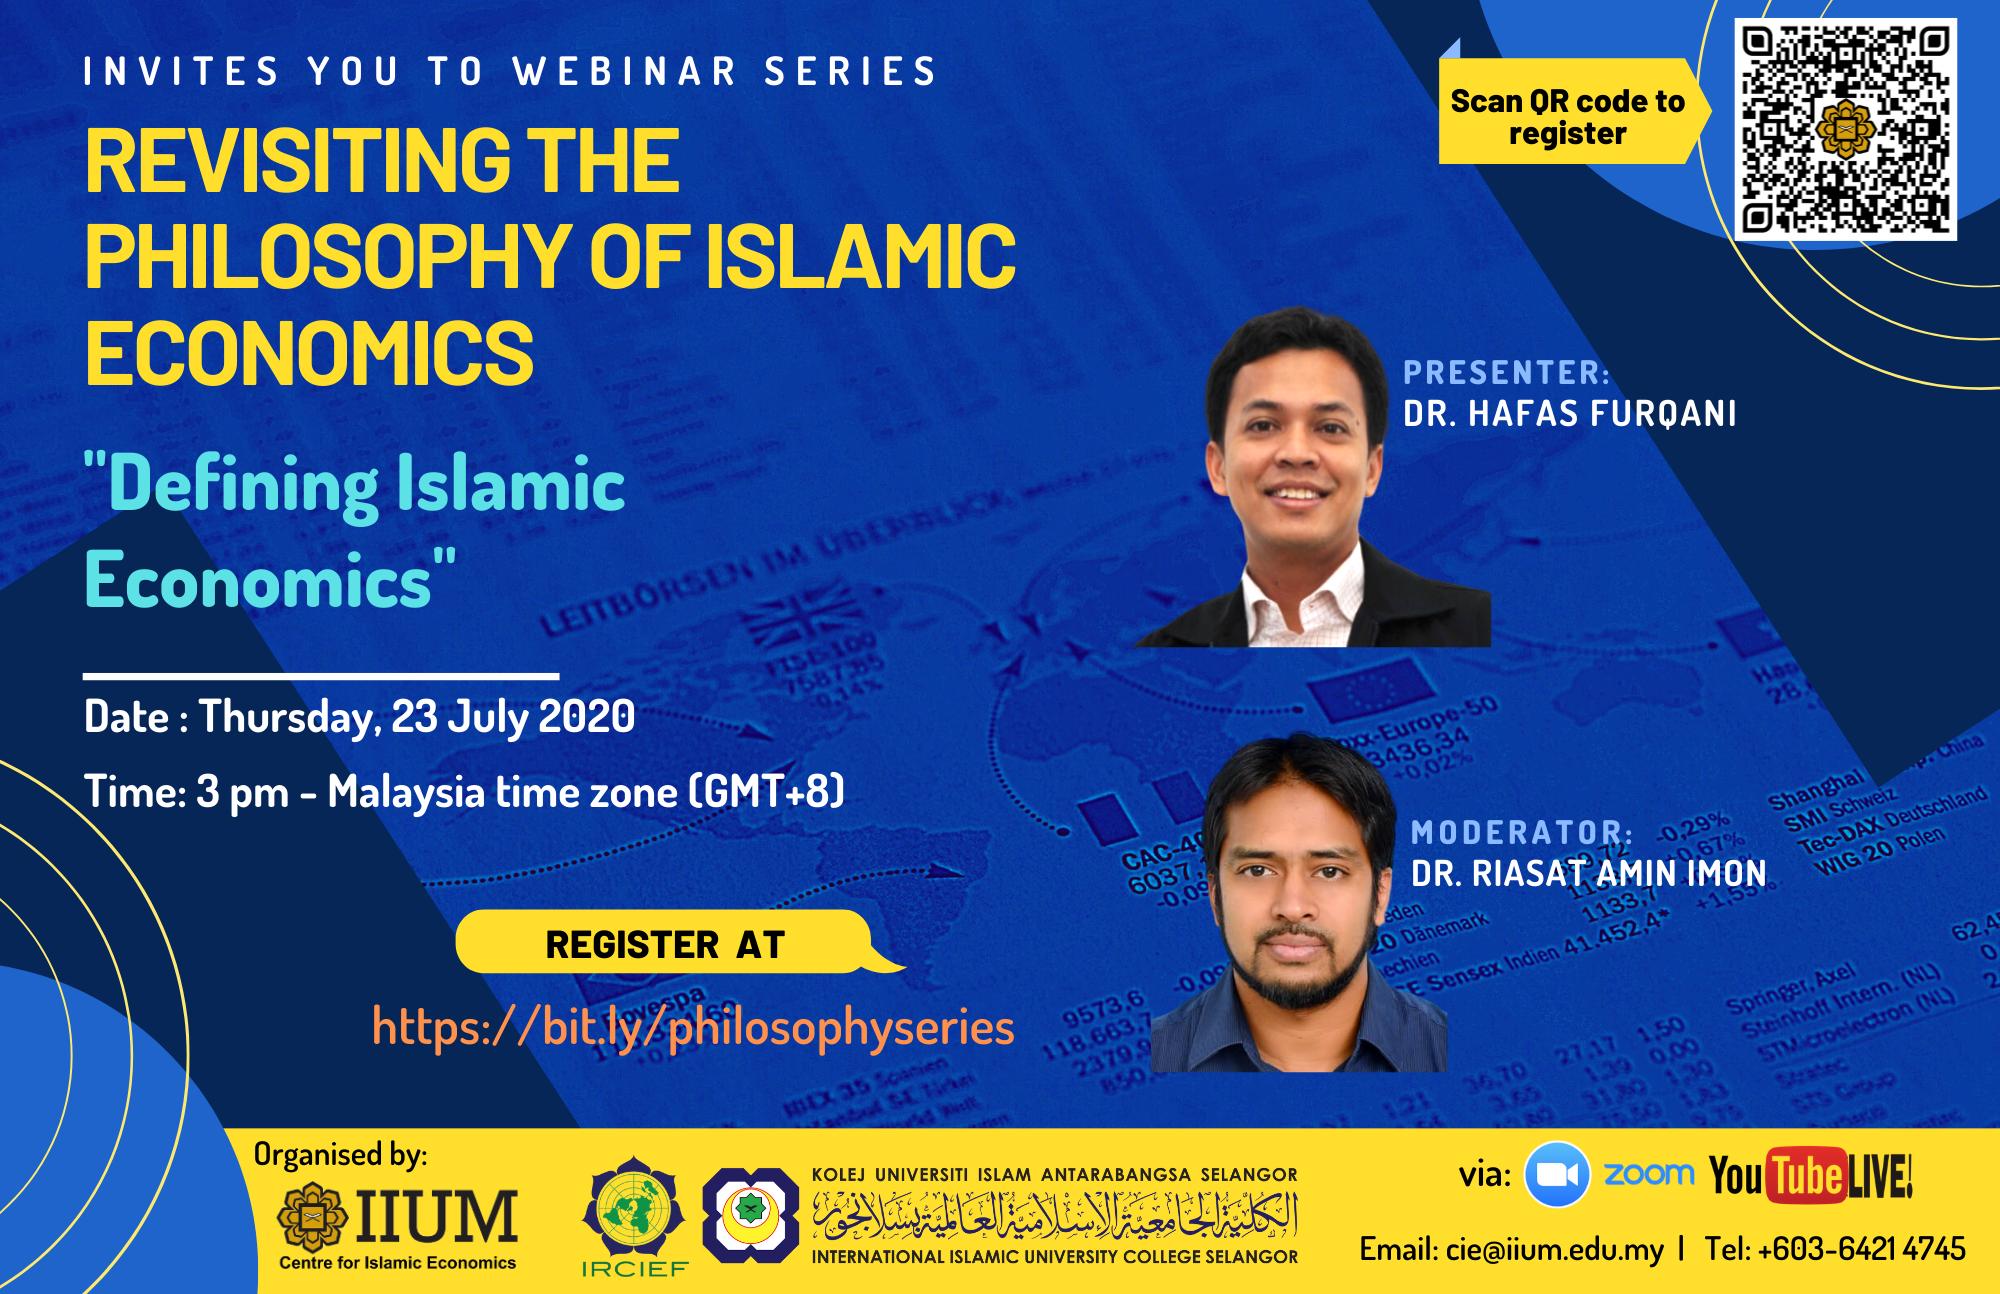 Revisiting The Philosophy of Islamic Economics - DEFINING ISLAMIC ECONOMICS